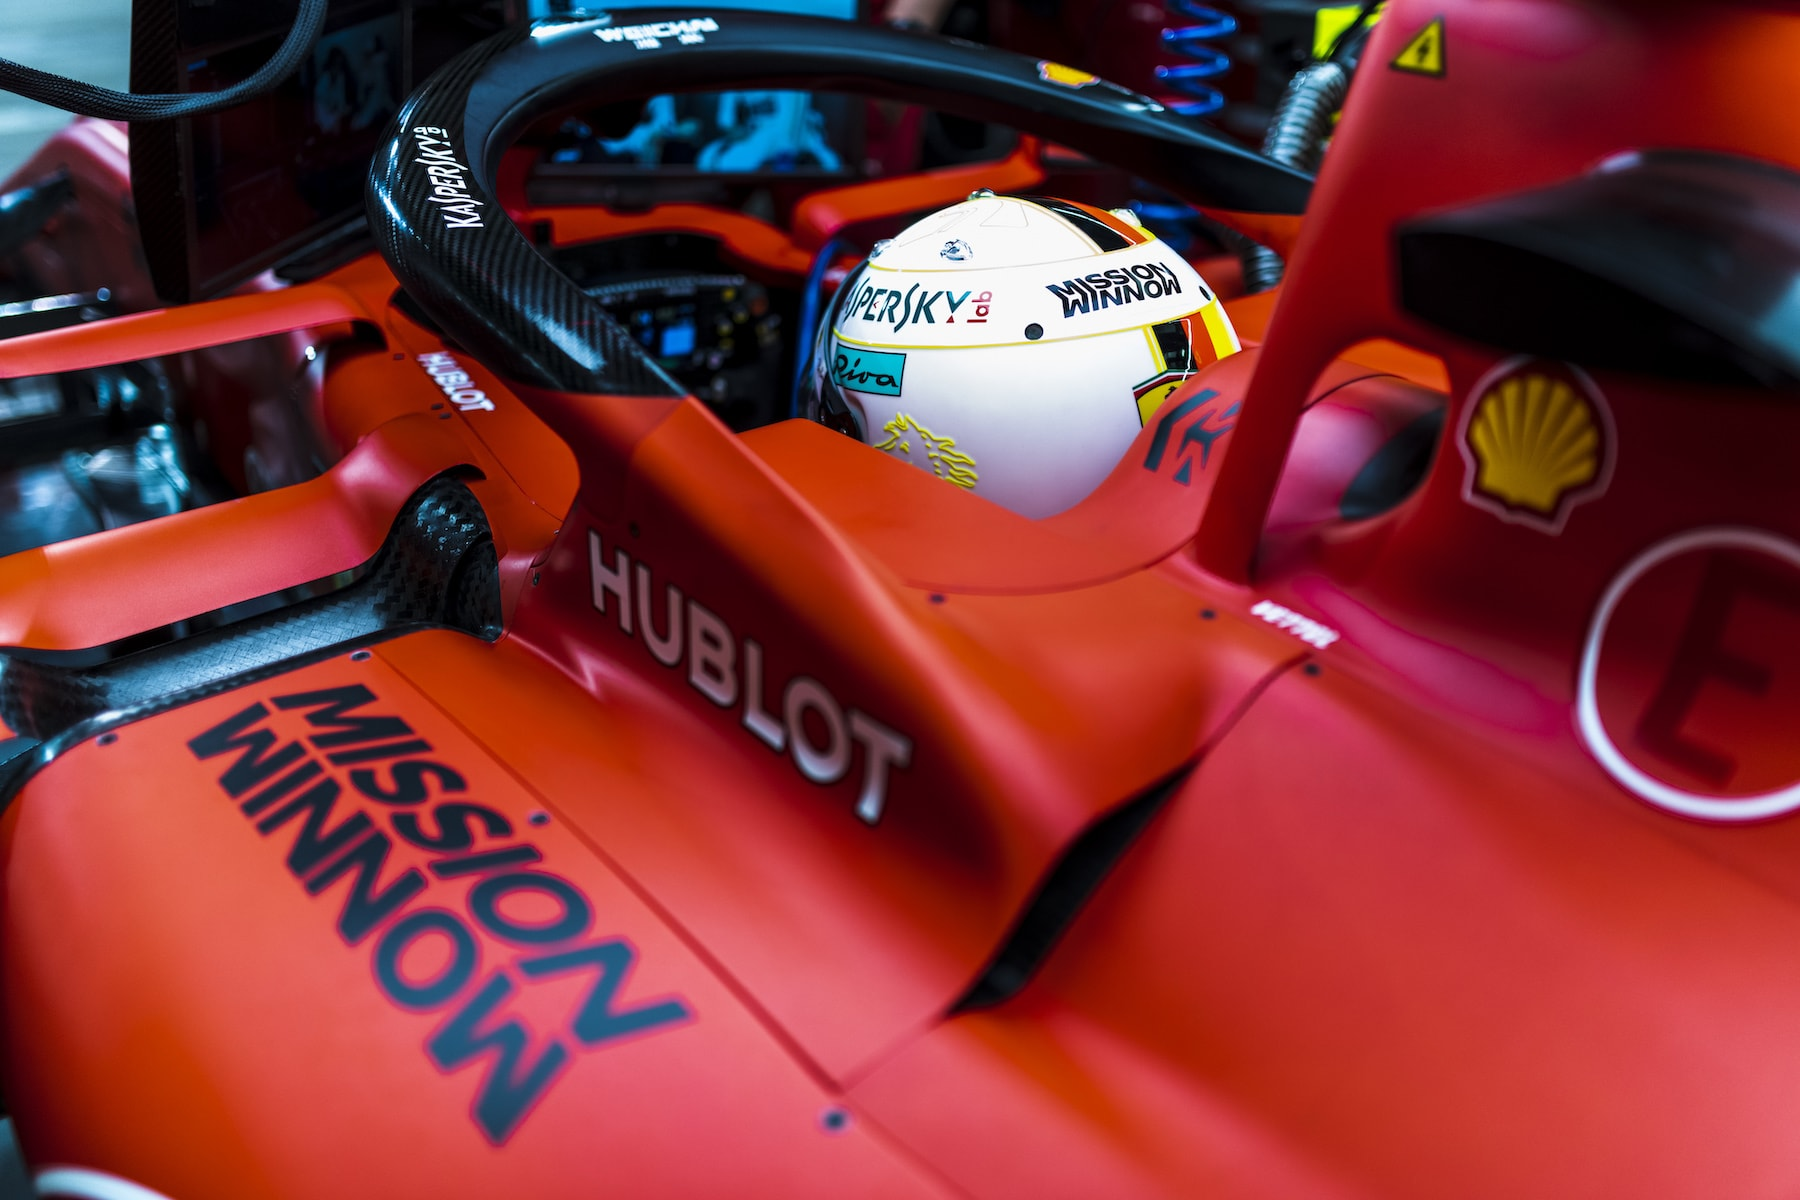 1 2019 Sebastian Vettel | Ferrari SF90 | 2019 Bahrain GP FP2 4 copy.jpg